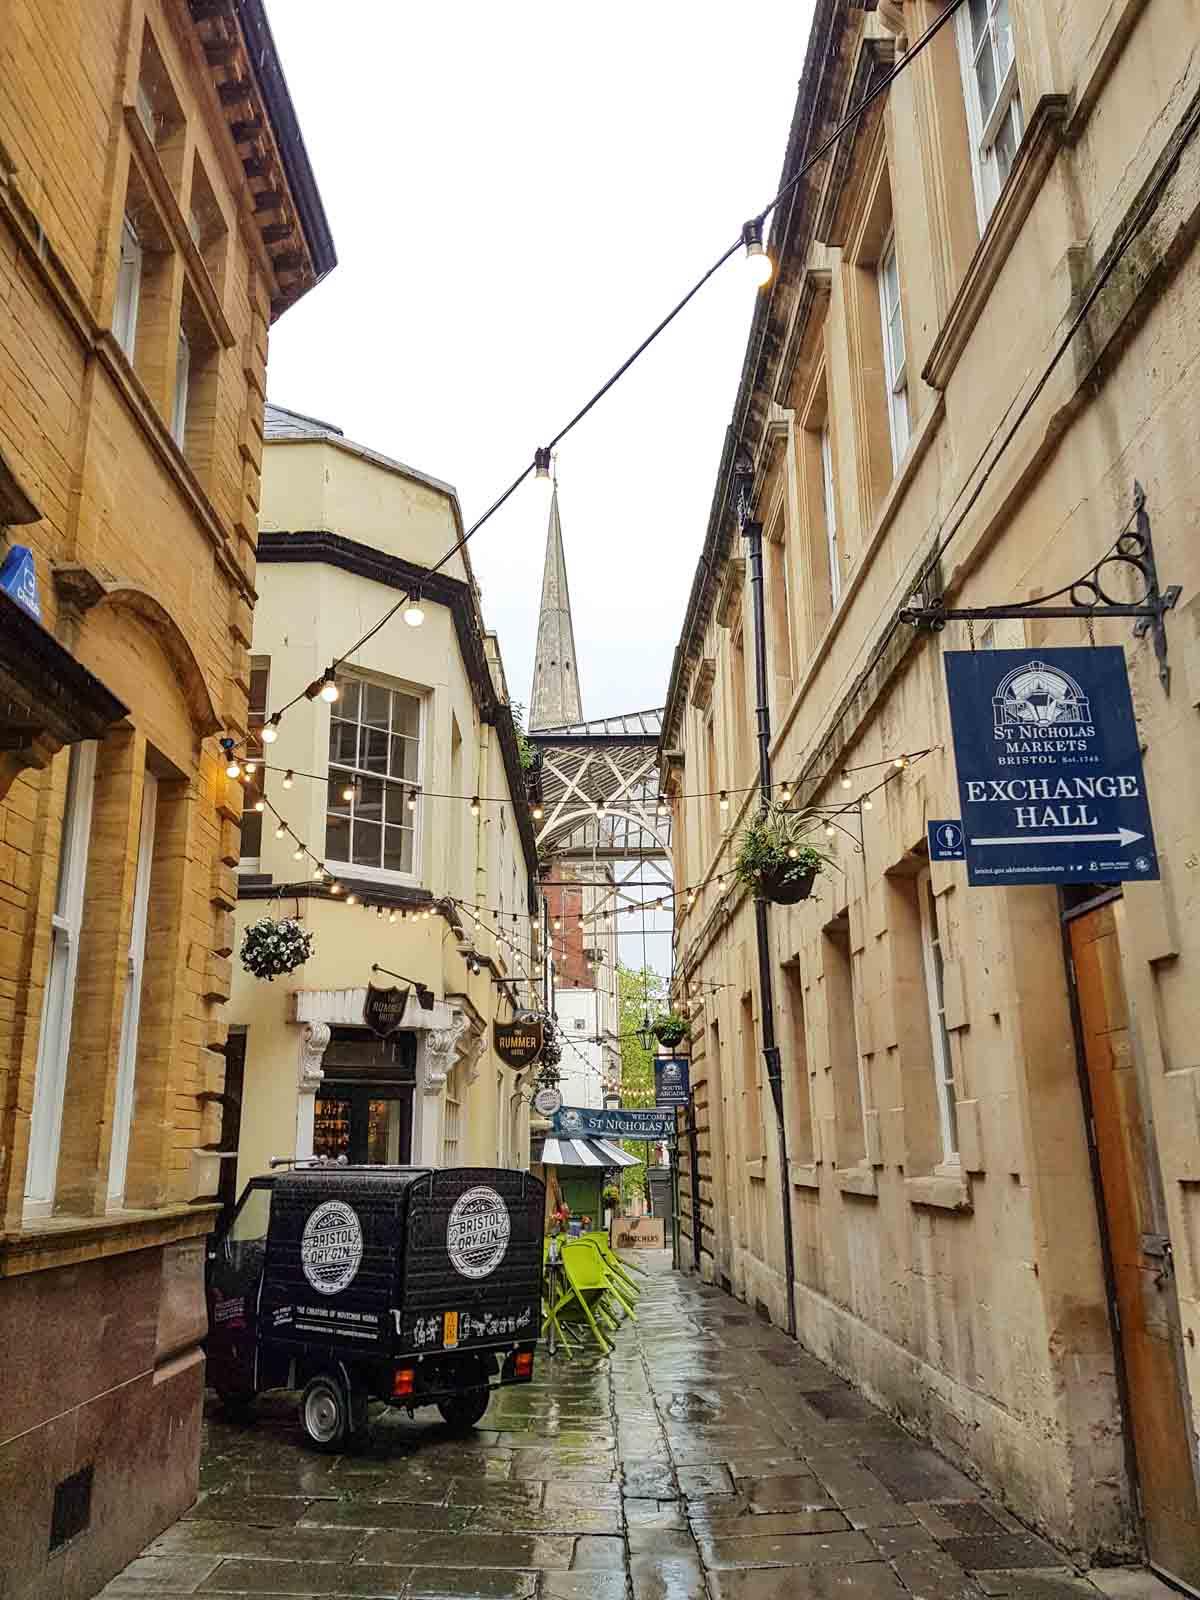 St Nicholas Markets, De leukste dingen om te doen in Bristol - Map of Joy